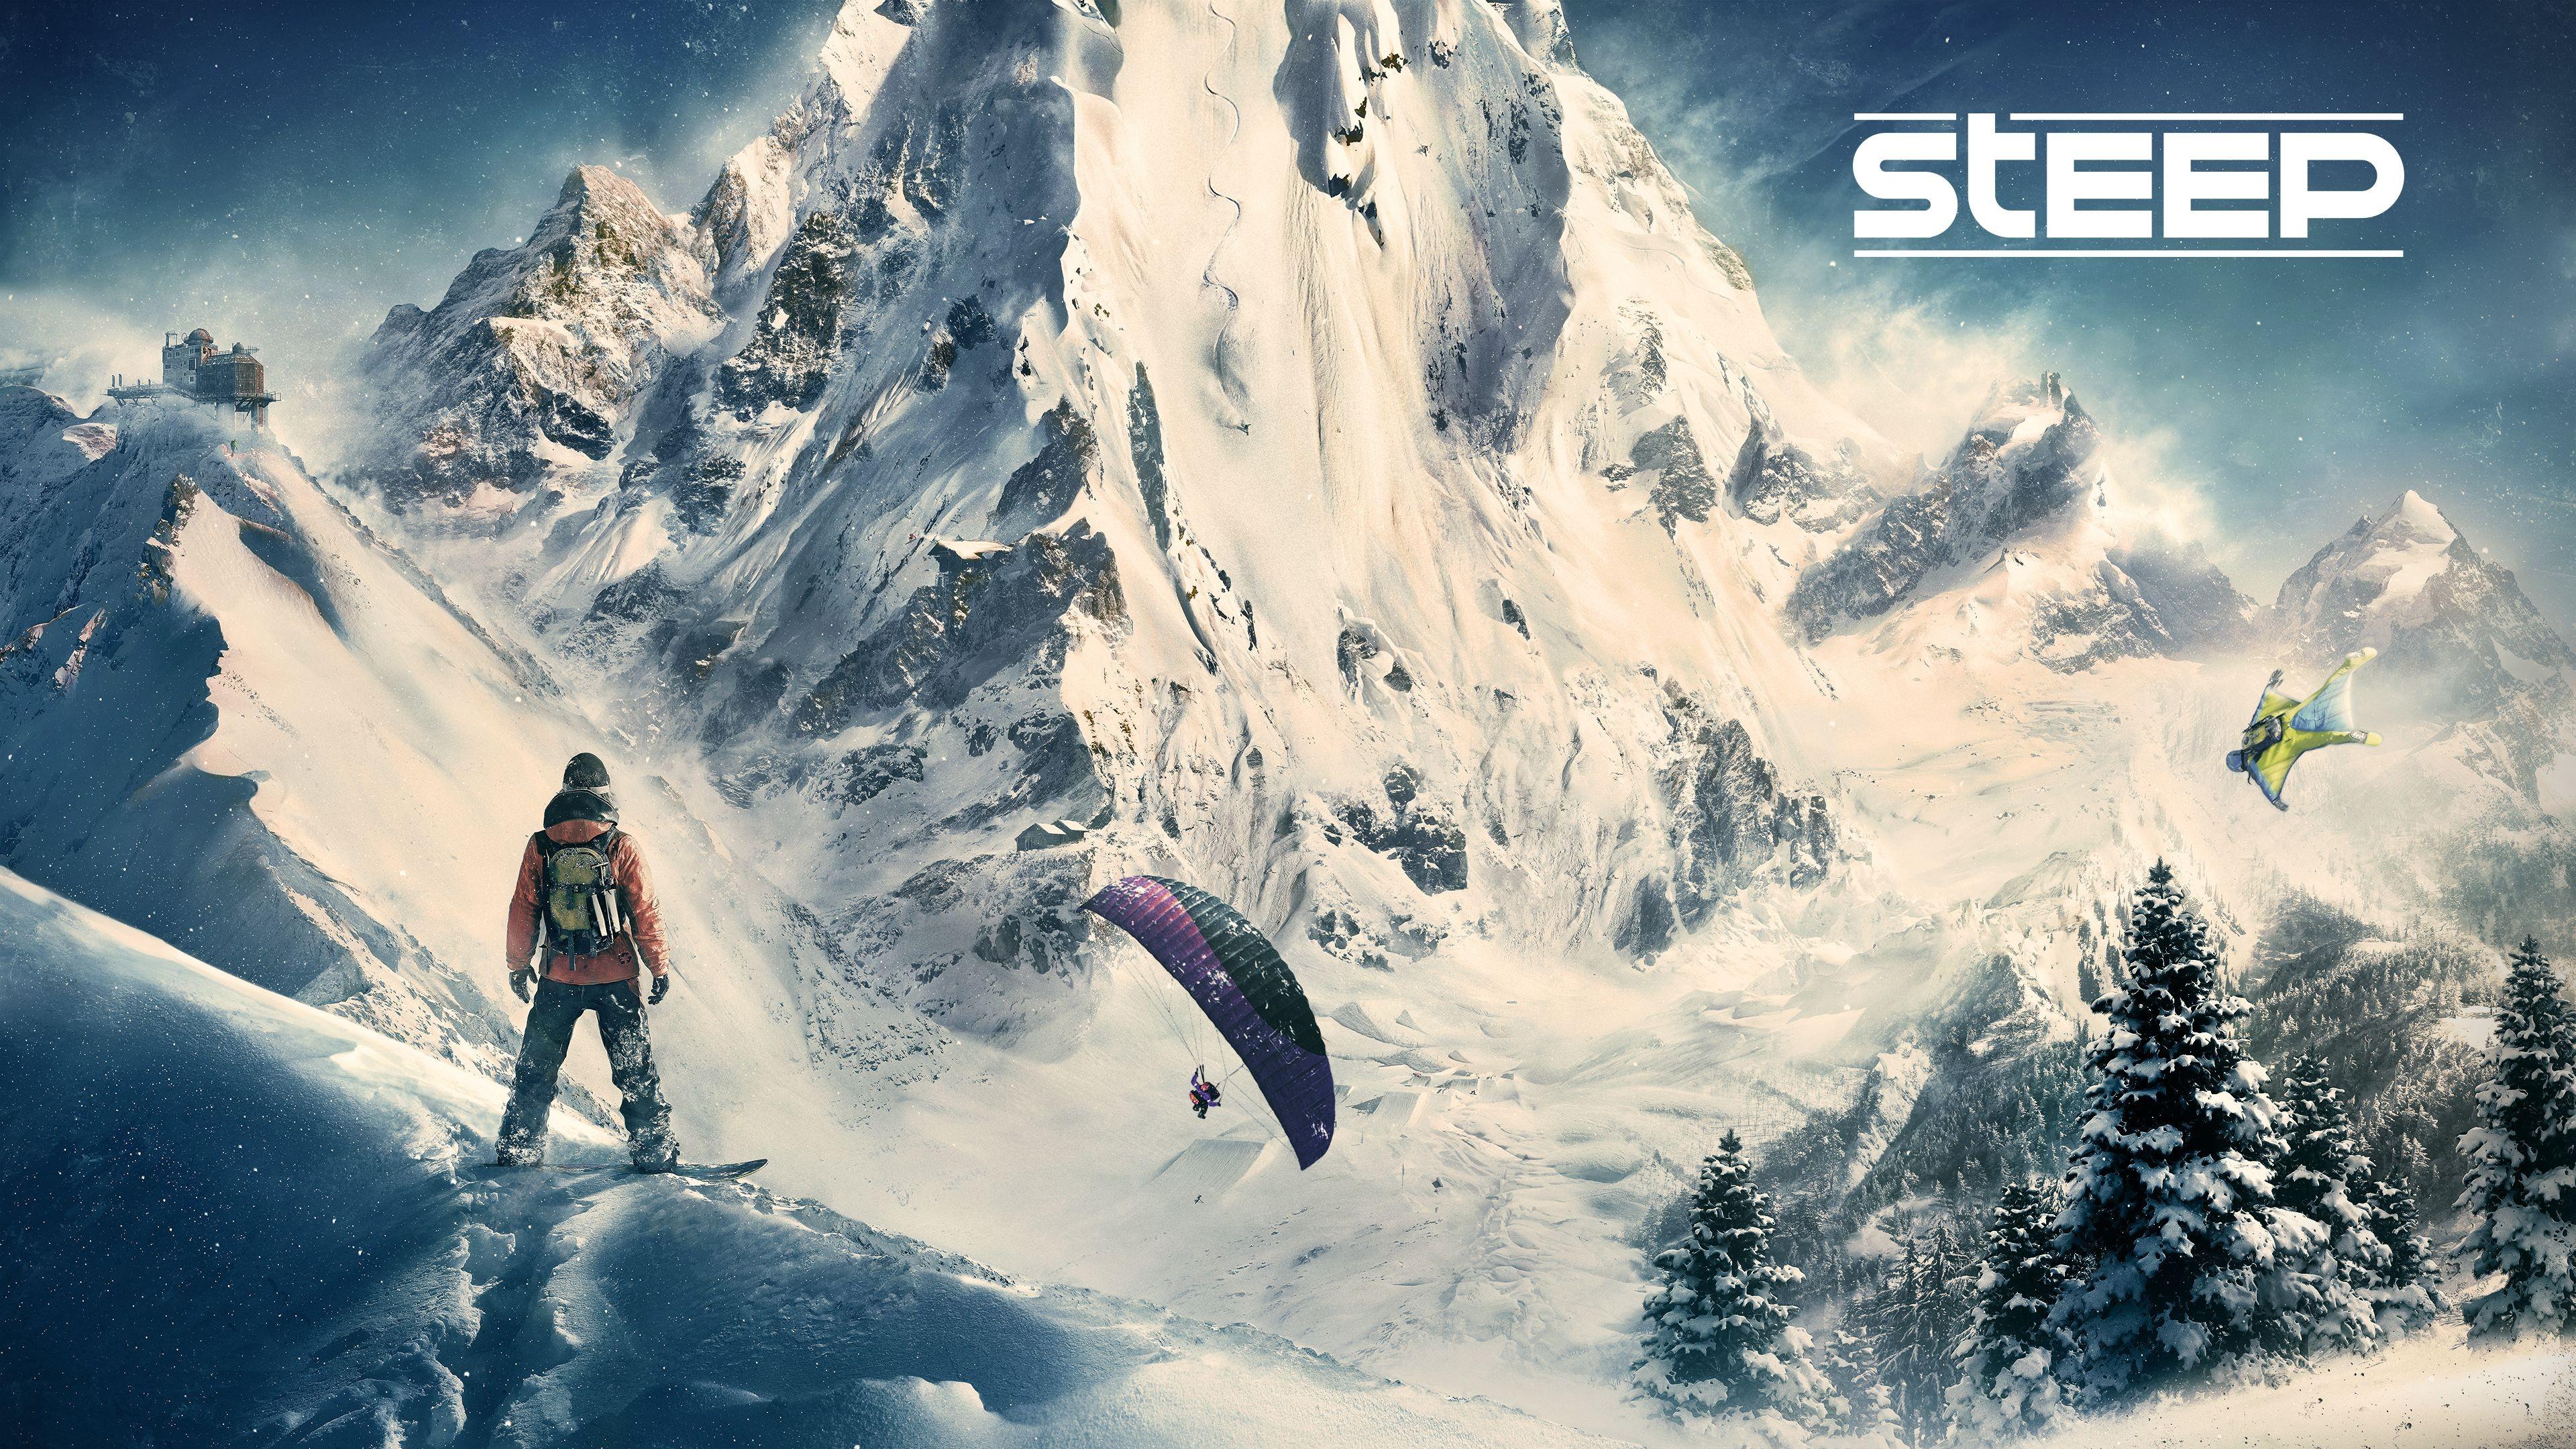 Video Games Snow Winter Ubisoft Snowboard Steep Skiing Ski Mountain Weather Piste Screenshot Computer Wallpaper Atmosphere